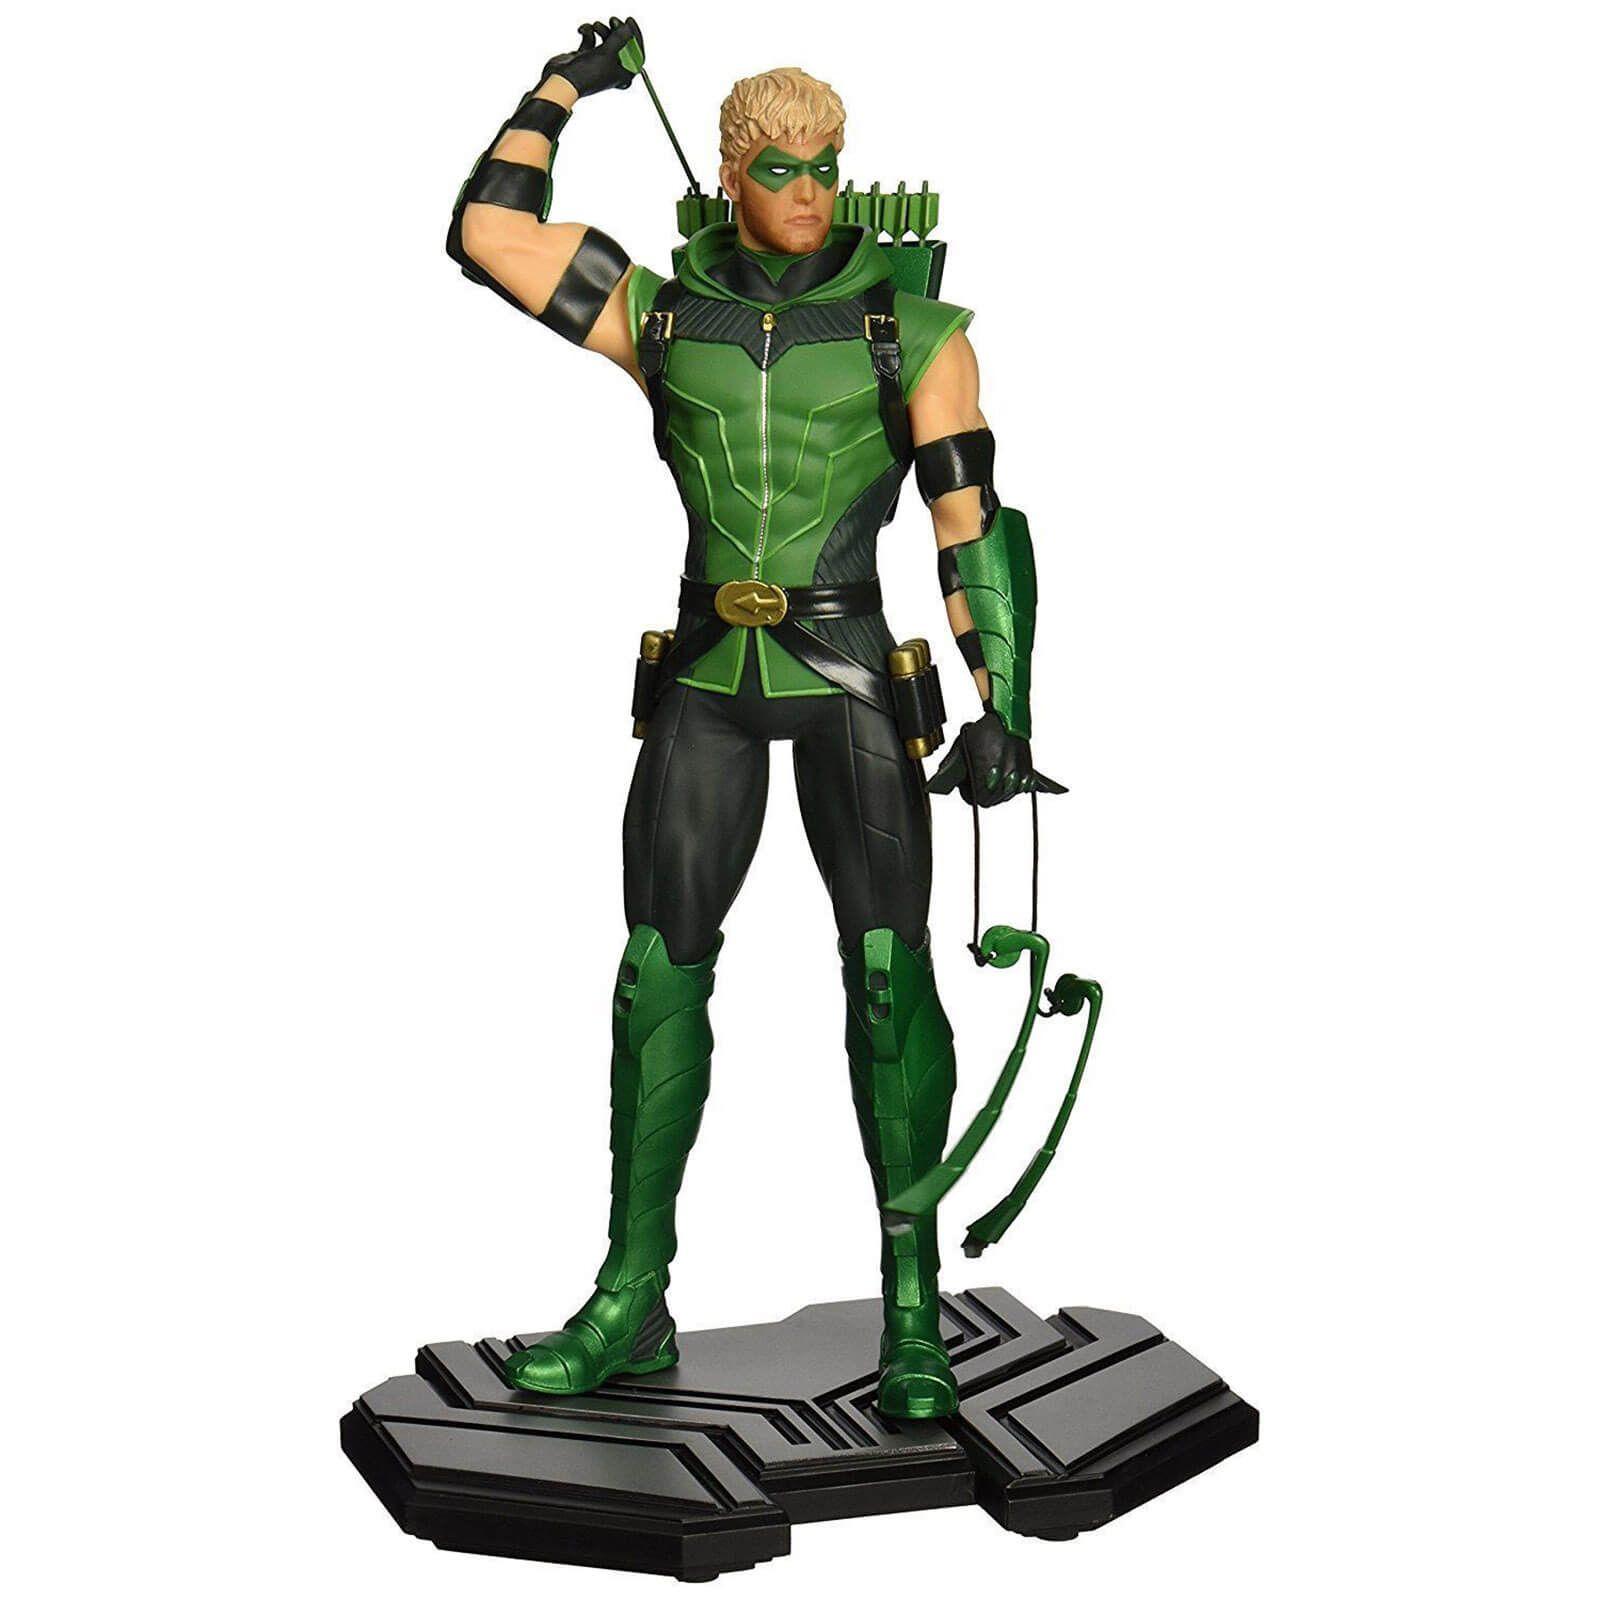 DC Collectibles DC Comics Icons Green Arrow Statue 27cm £16.98 delivered @ Zavvi